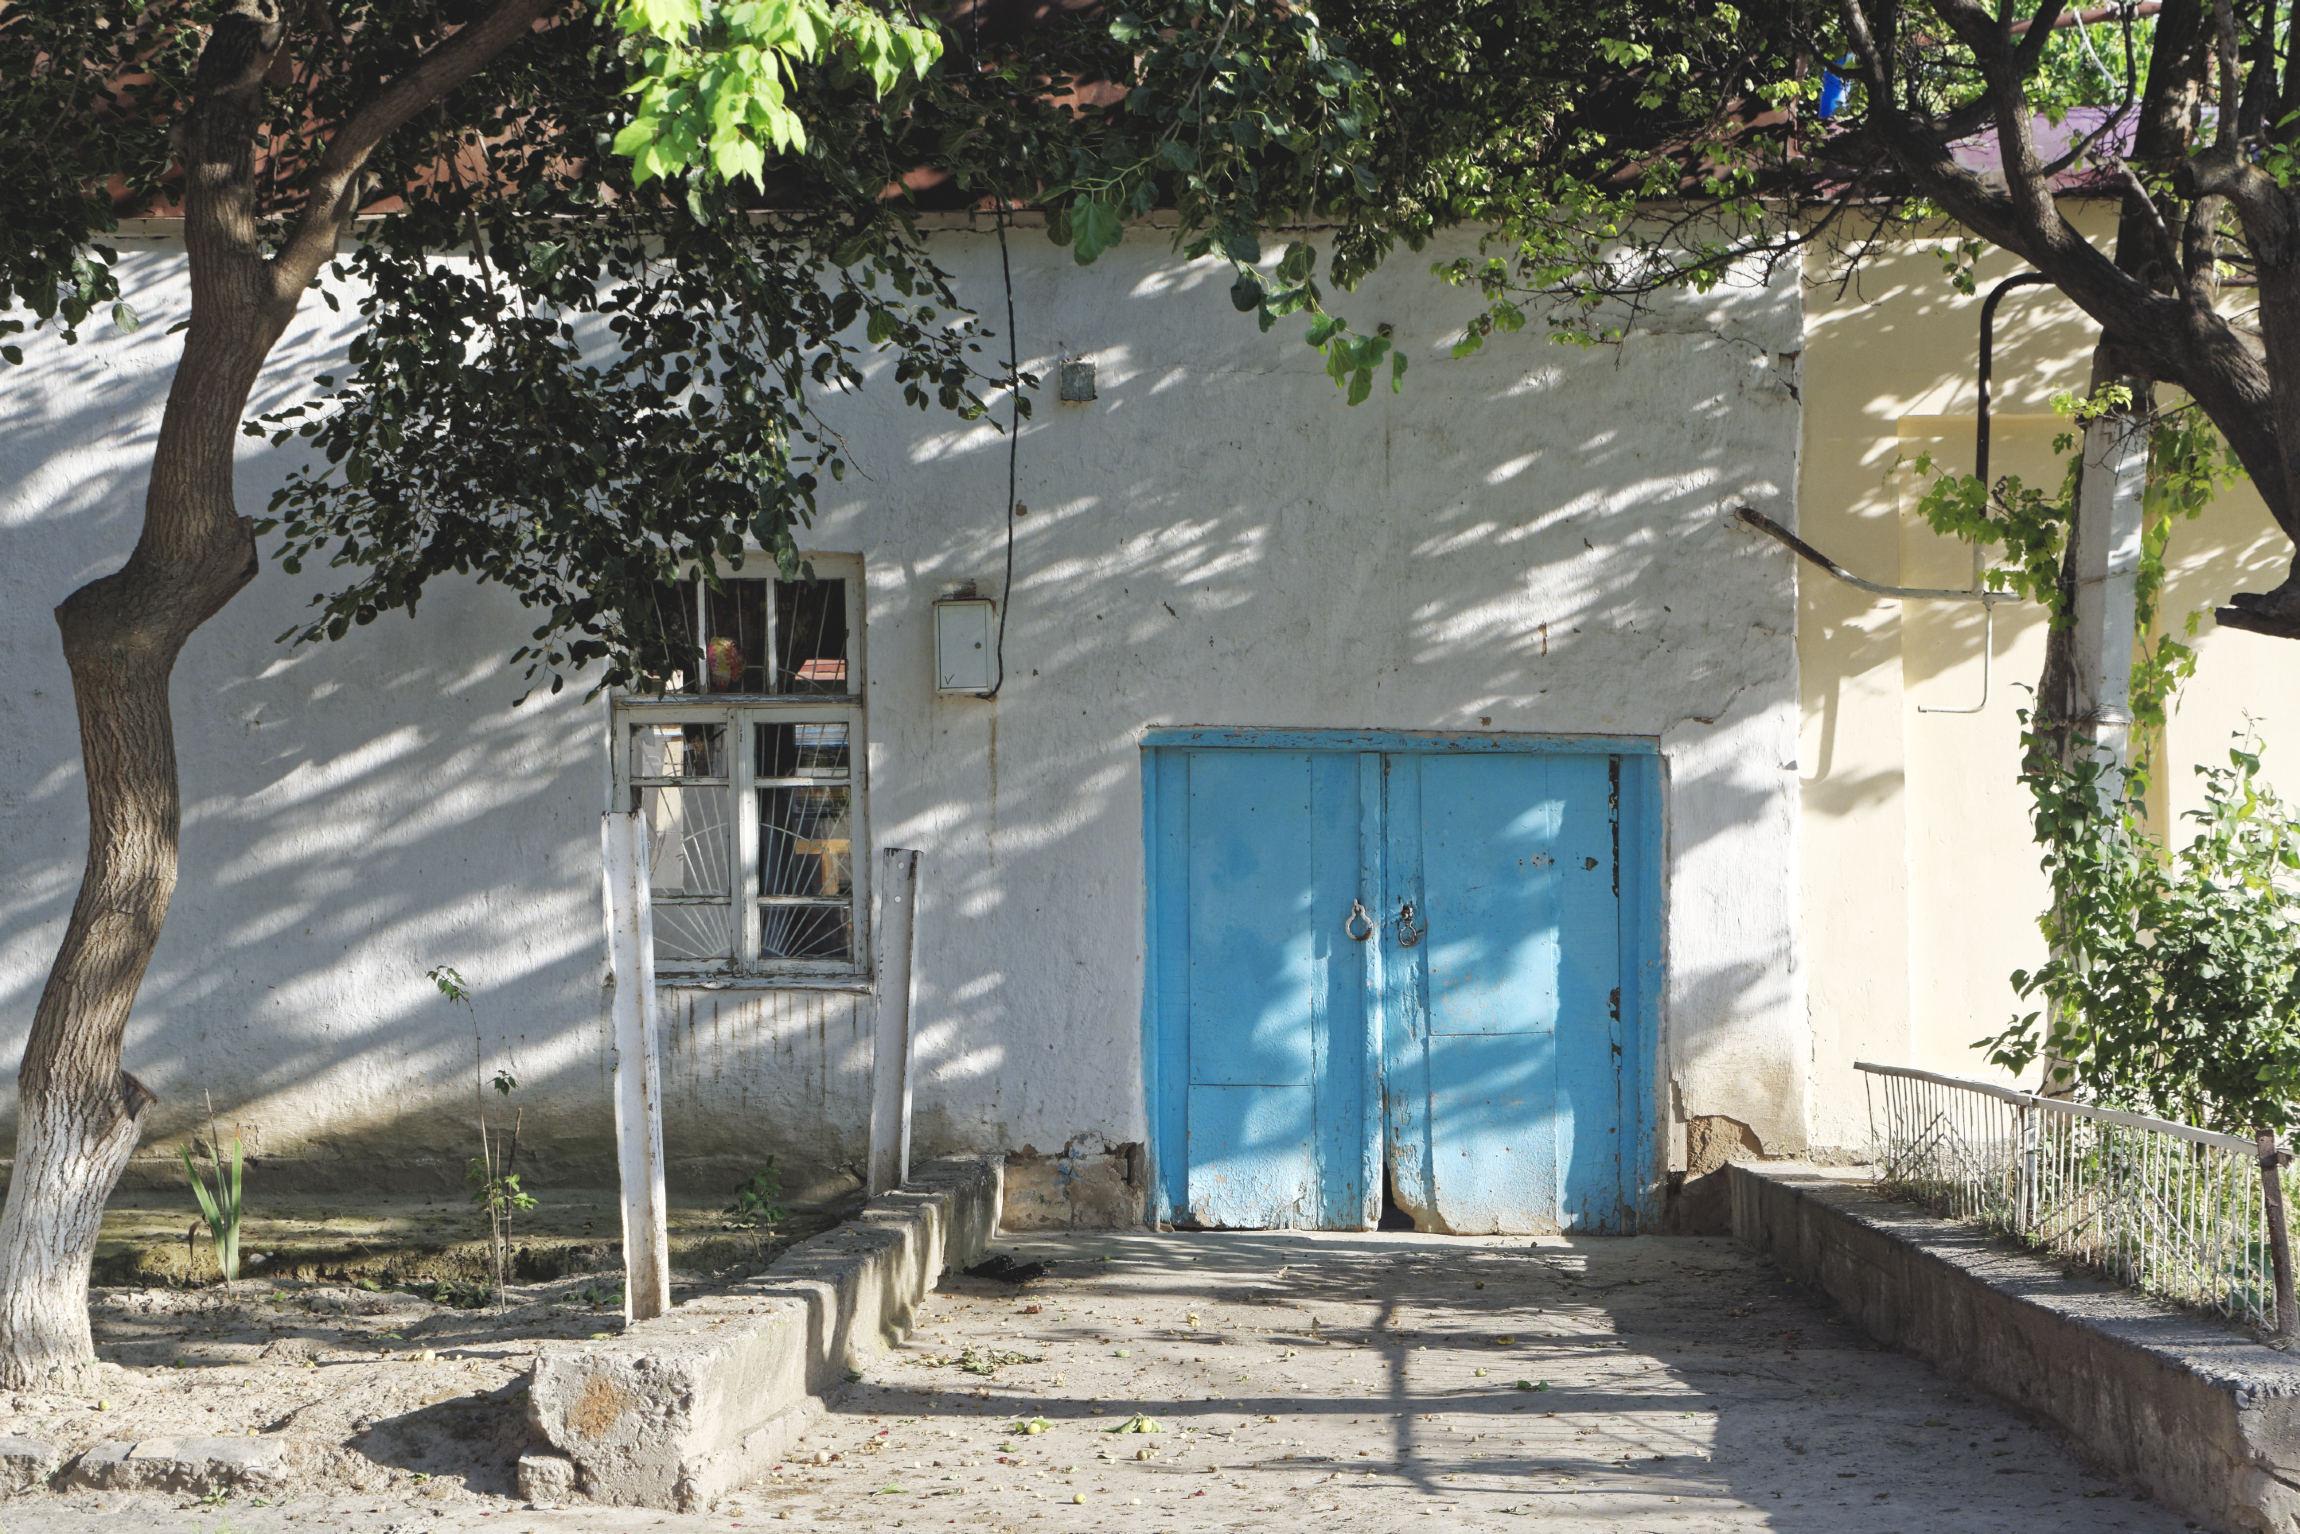 Vieux quartier Samarcande